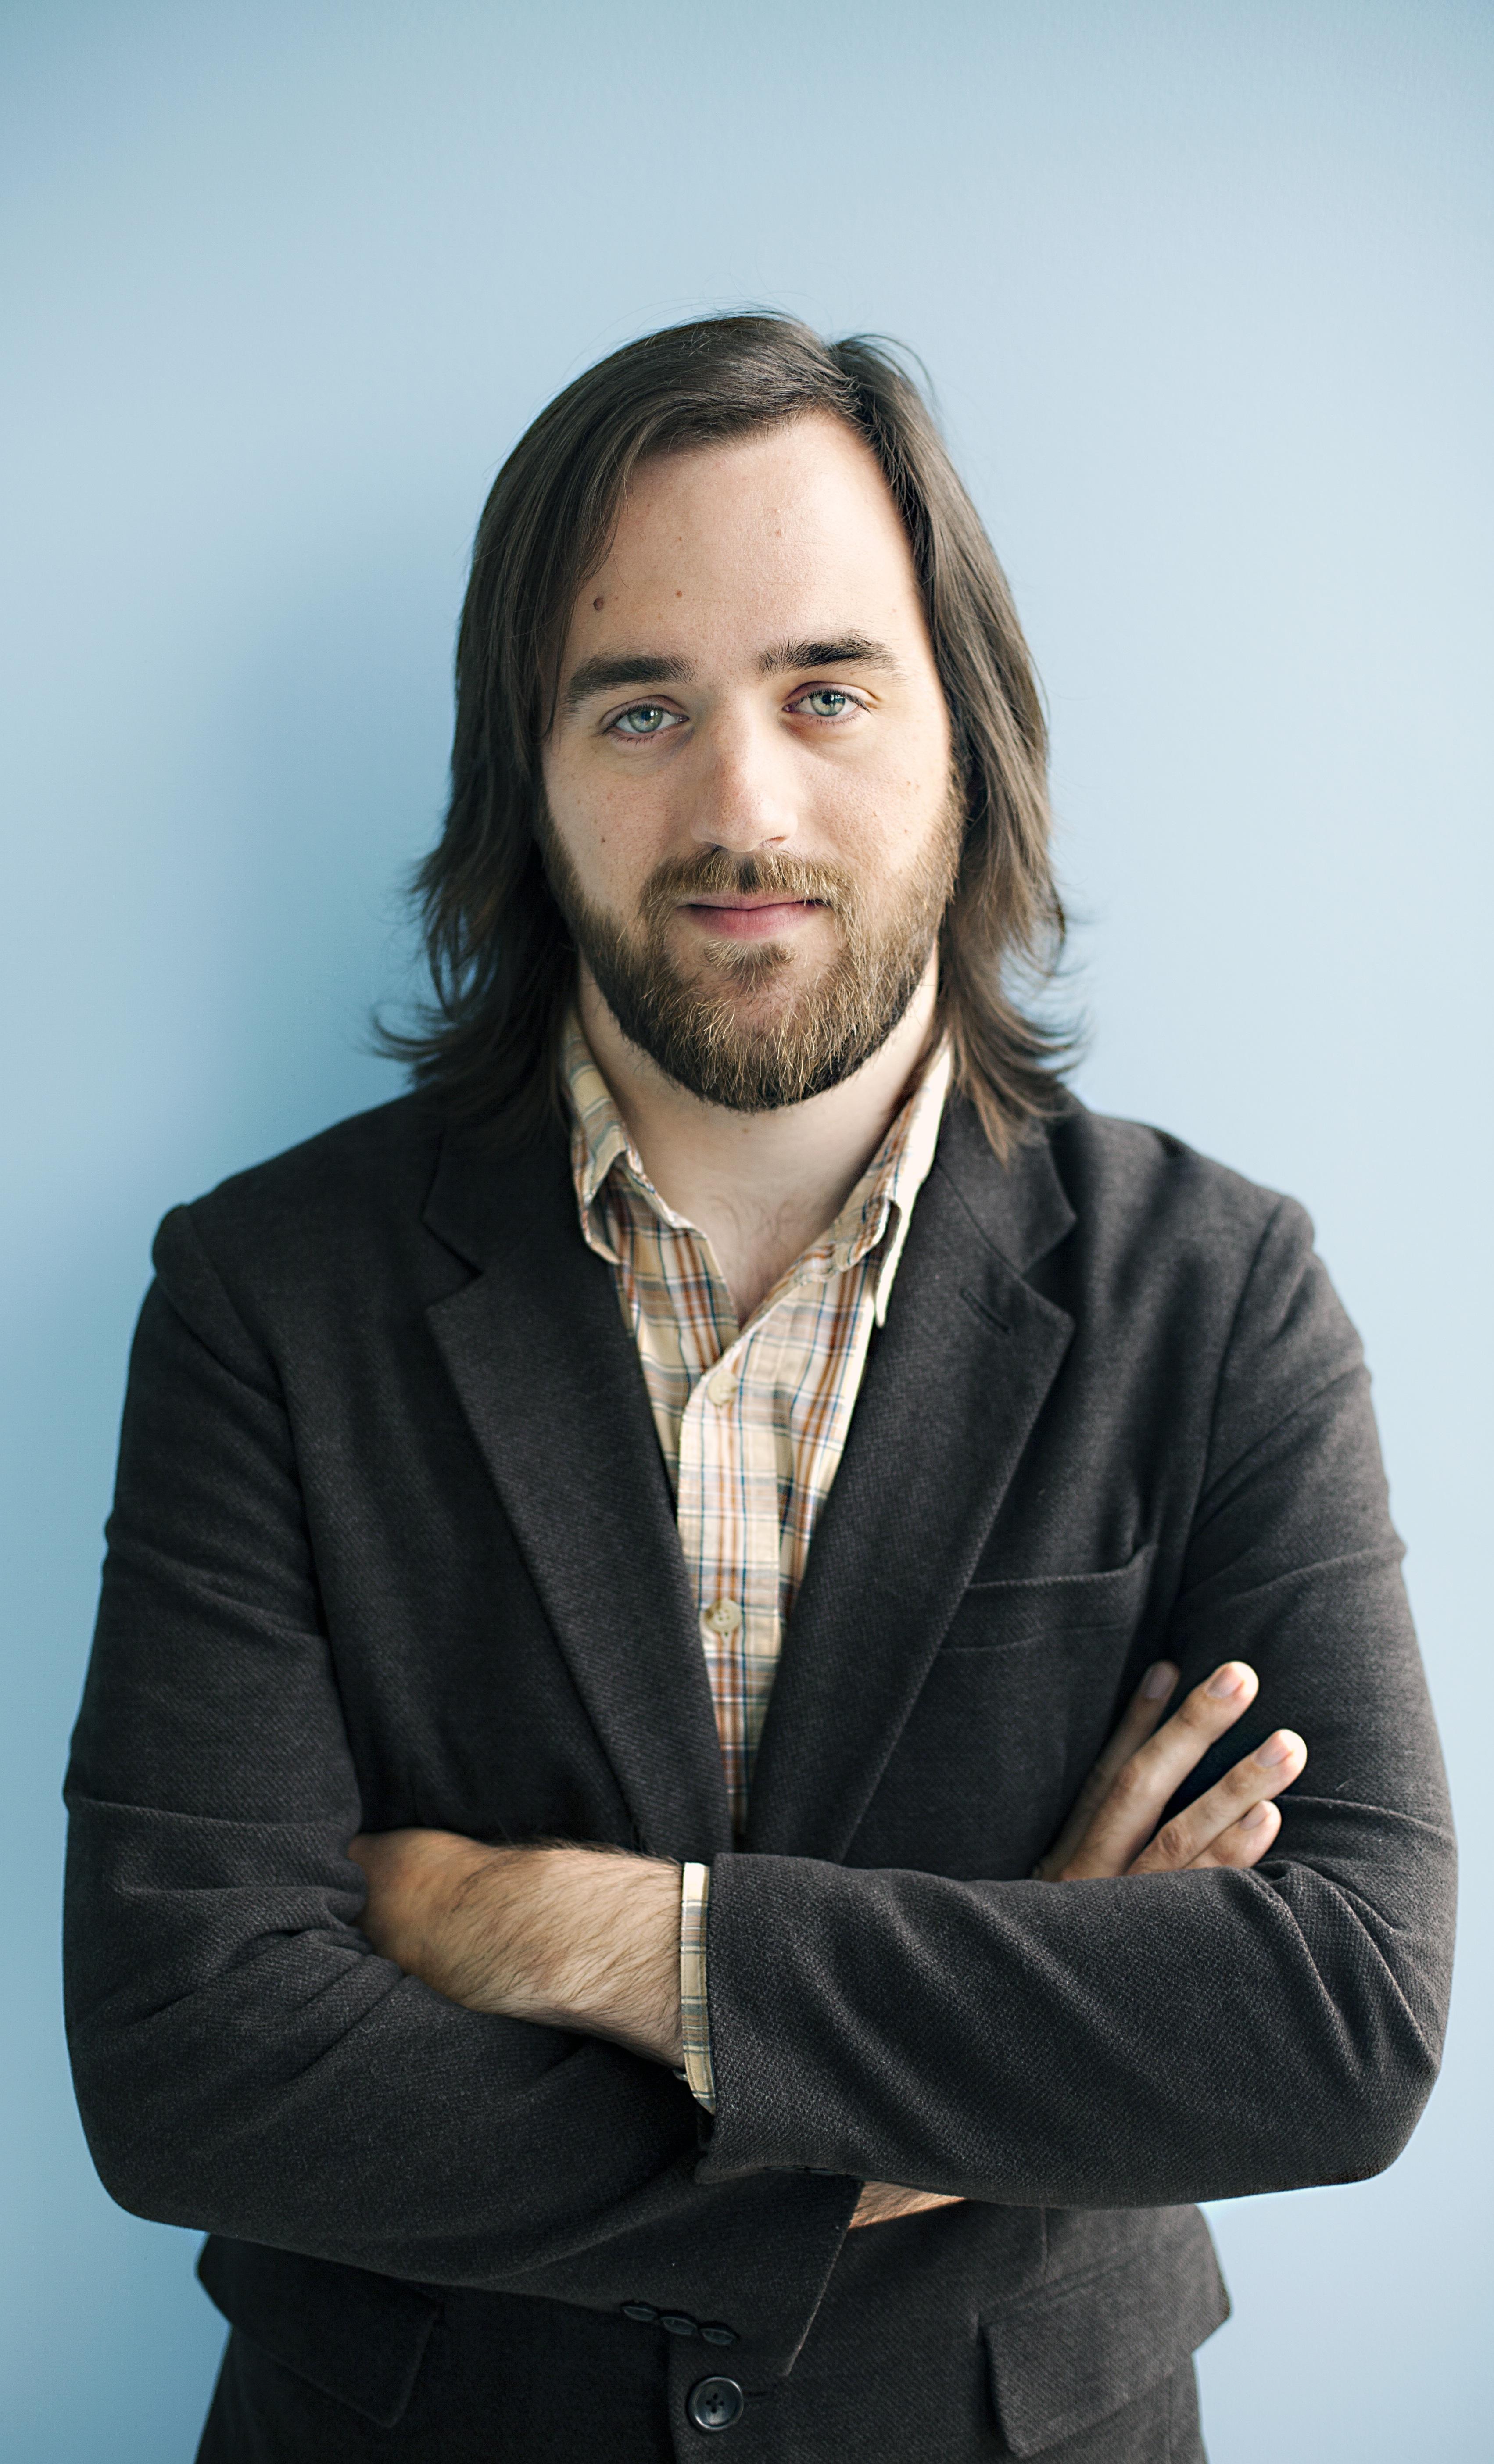 Sean Conner, Managing Editor